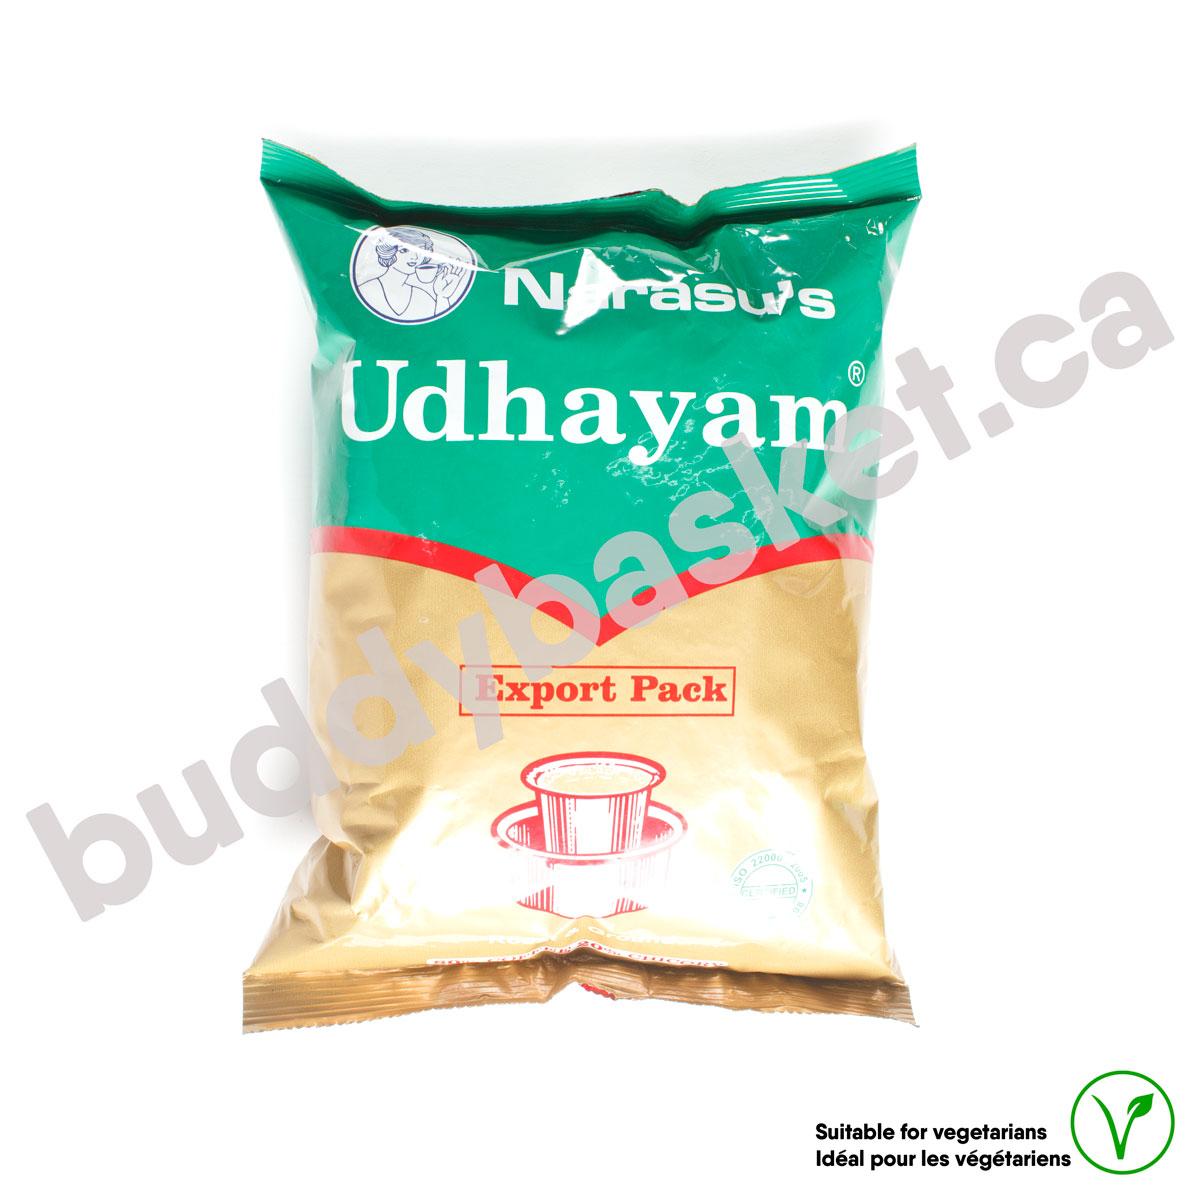 Narasu's Udhayam Filter Coffee 500g